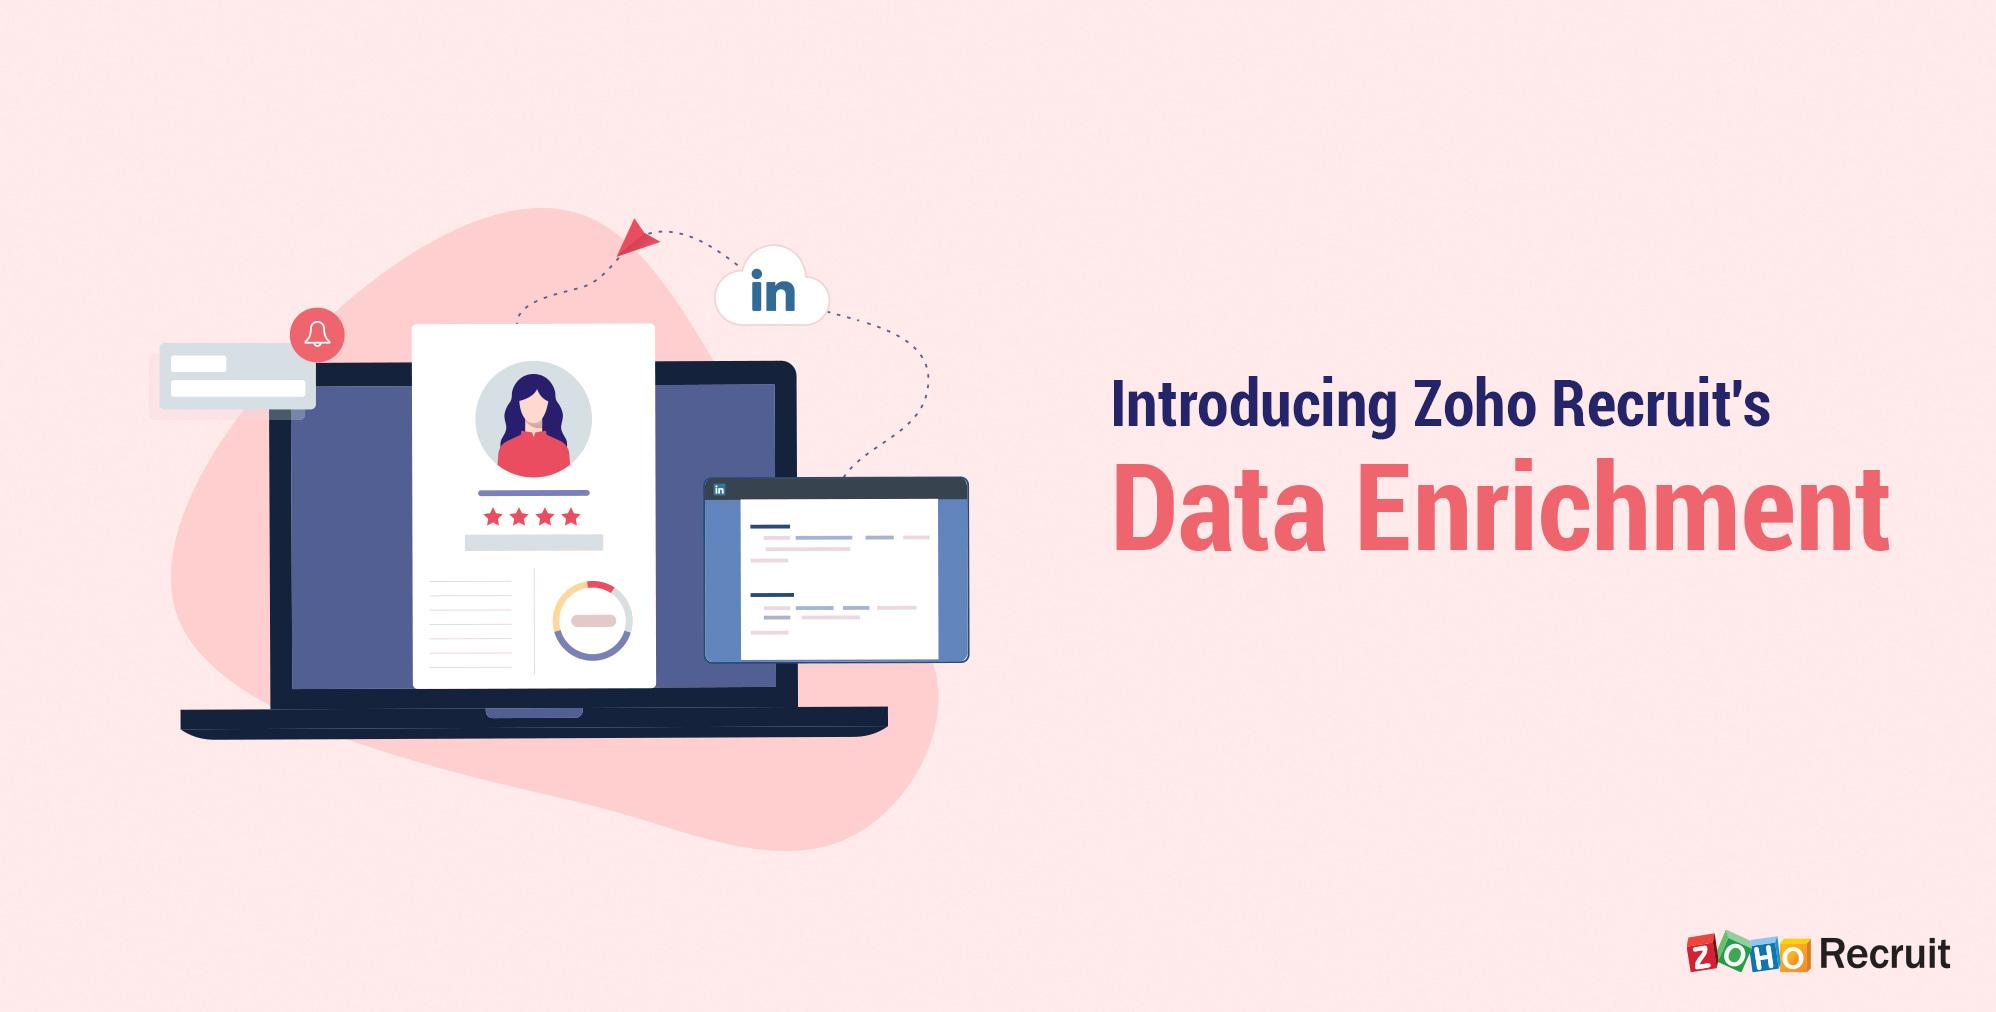 What's New - Zoho Recruit